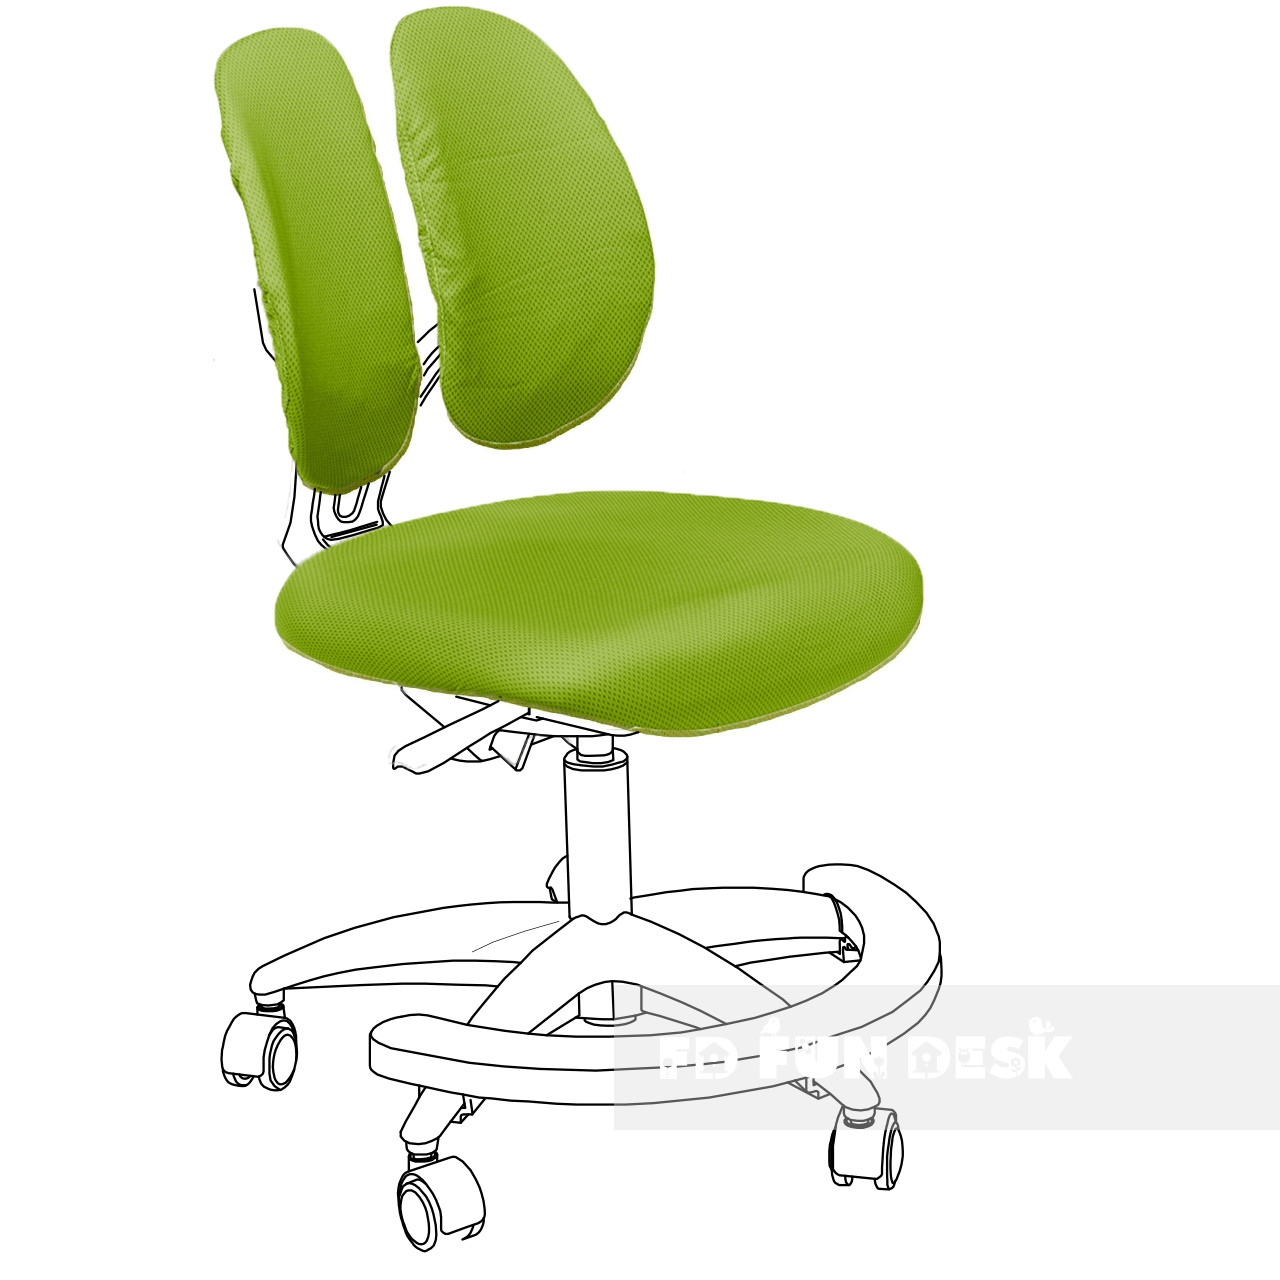 Чехол для кресла Primo green